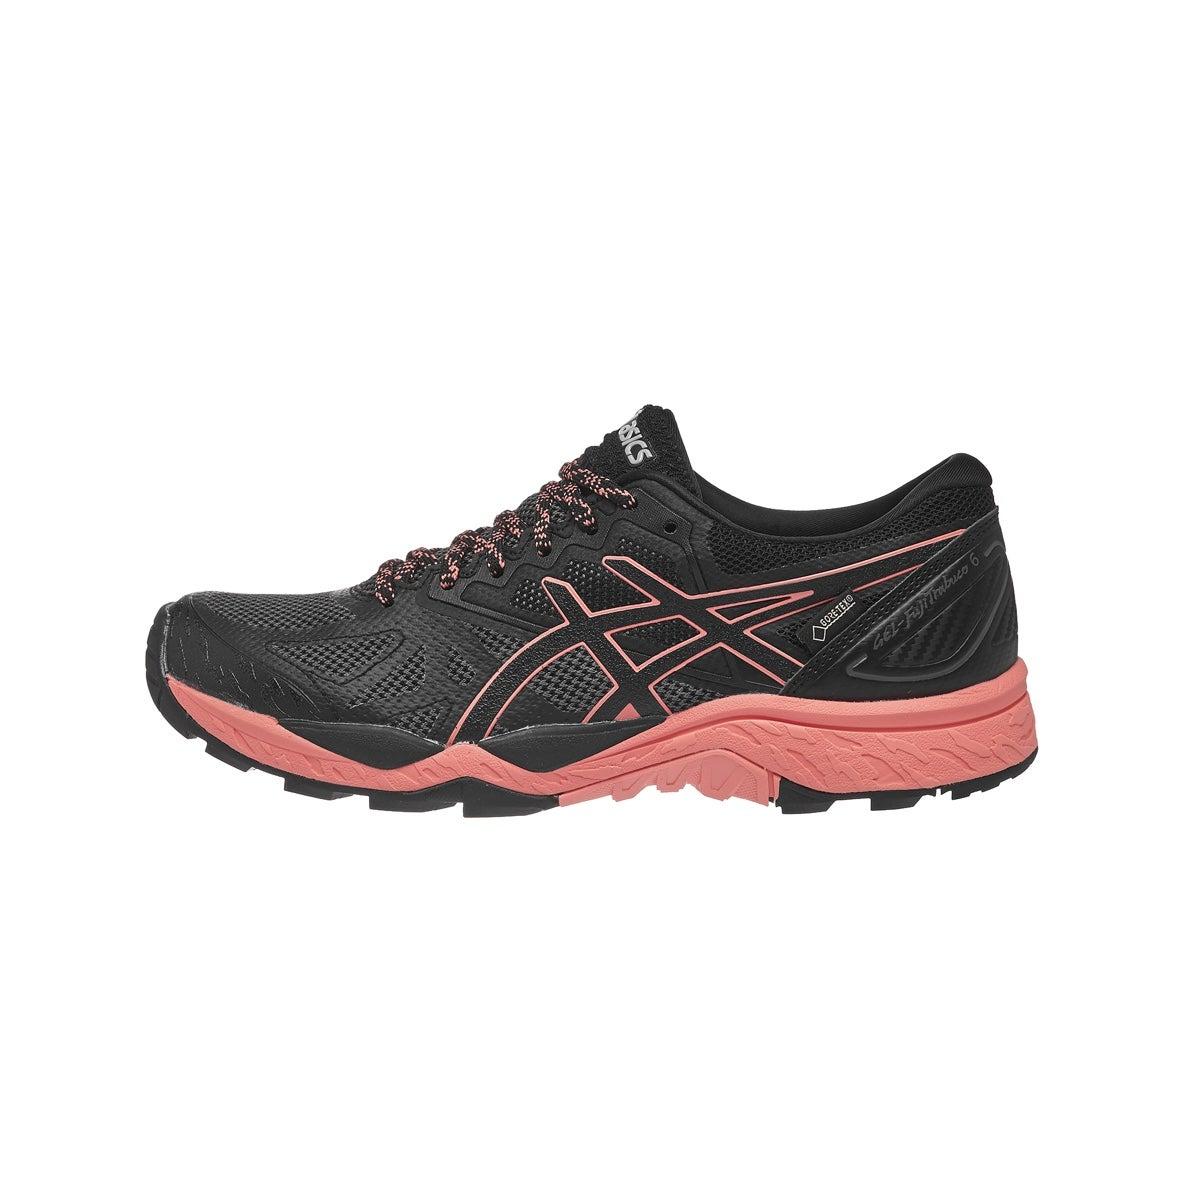 Asics Pink Black Shoes